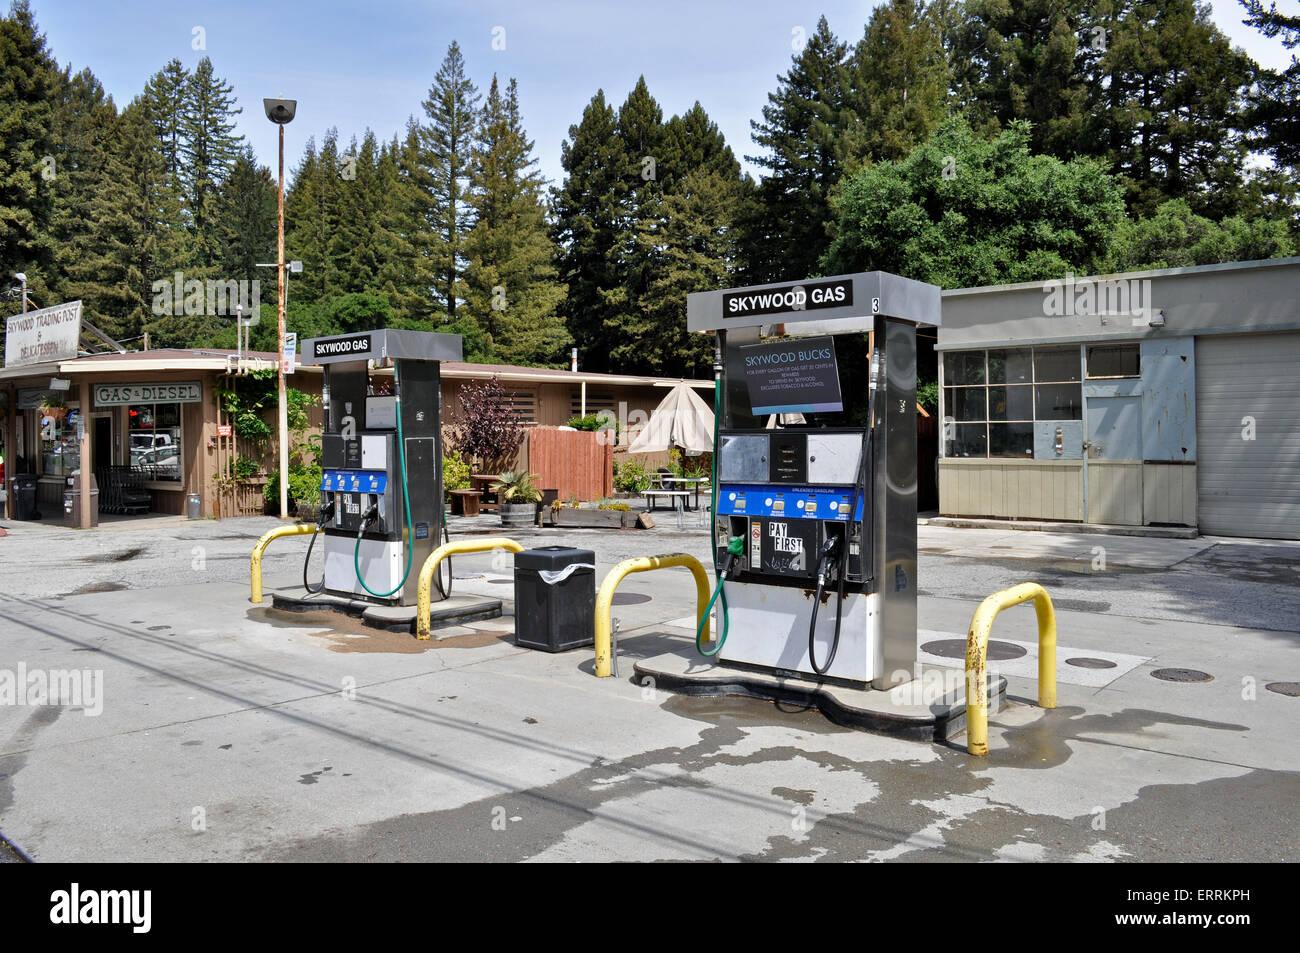 Gas pumps, Skywood Trading Post, Woodside, California - Stock Image